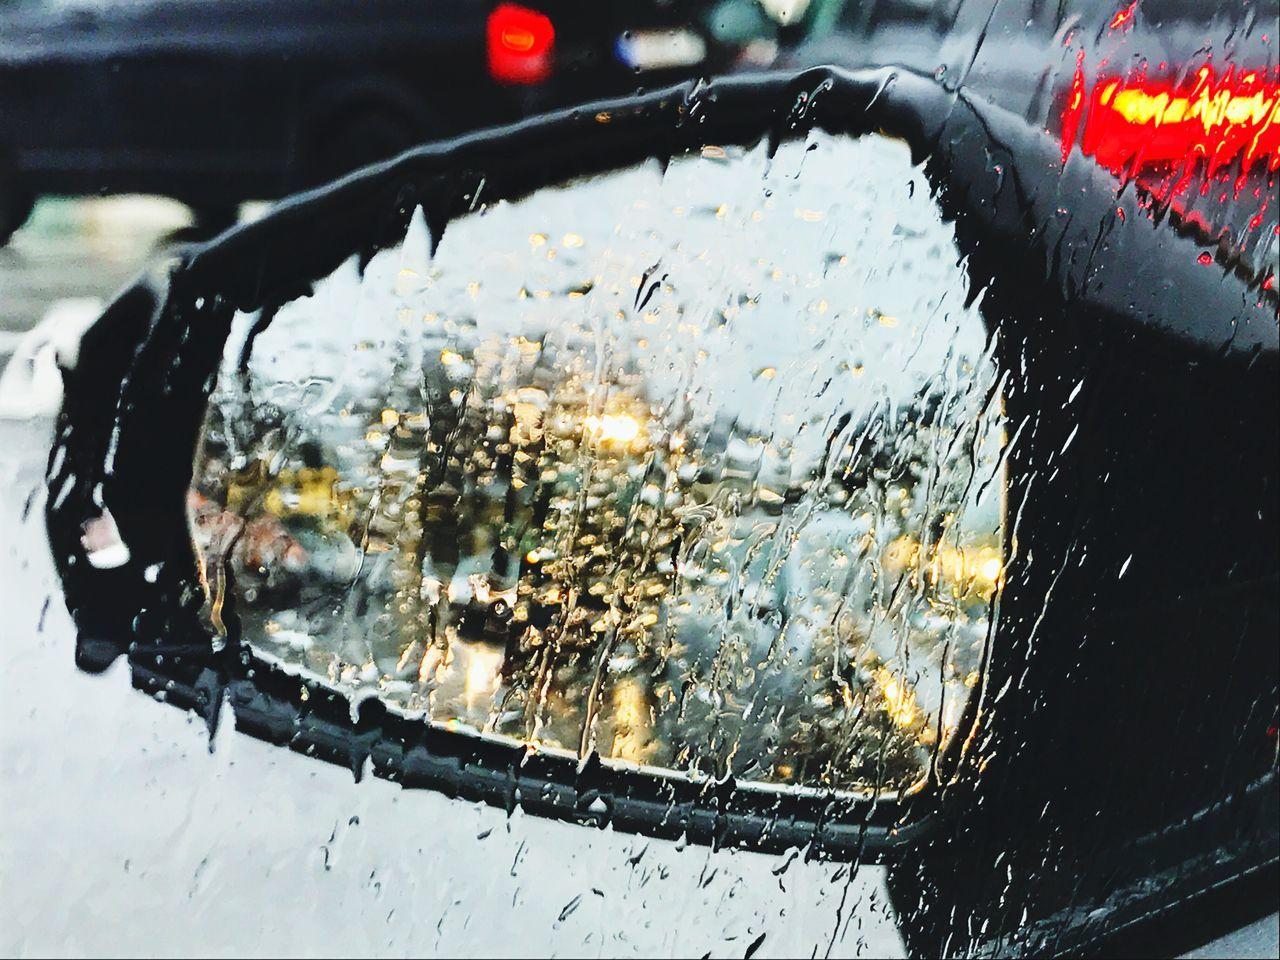 it's a rainy day today Raindrops Car Side-view Mirror Rain Rainy Days Driving Reflection Traffic Brake Lights